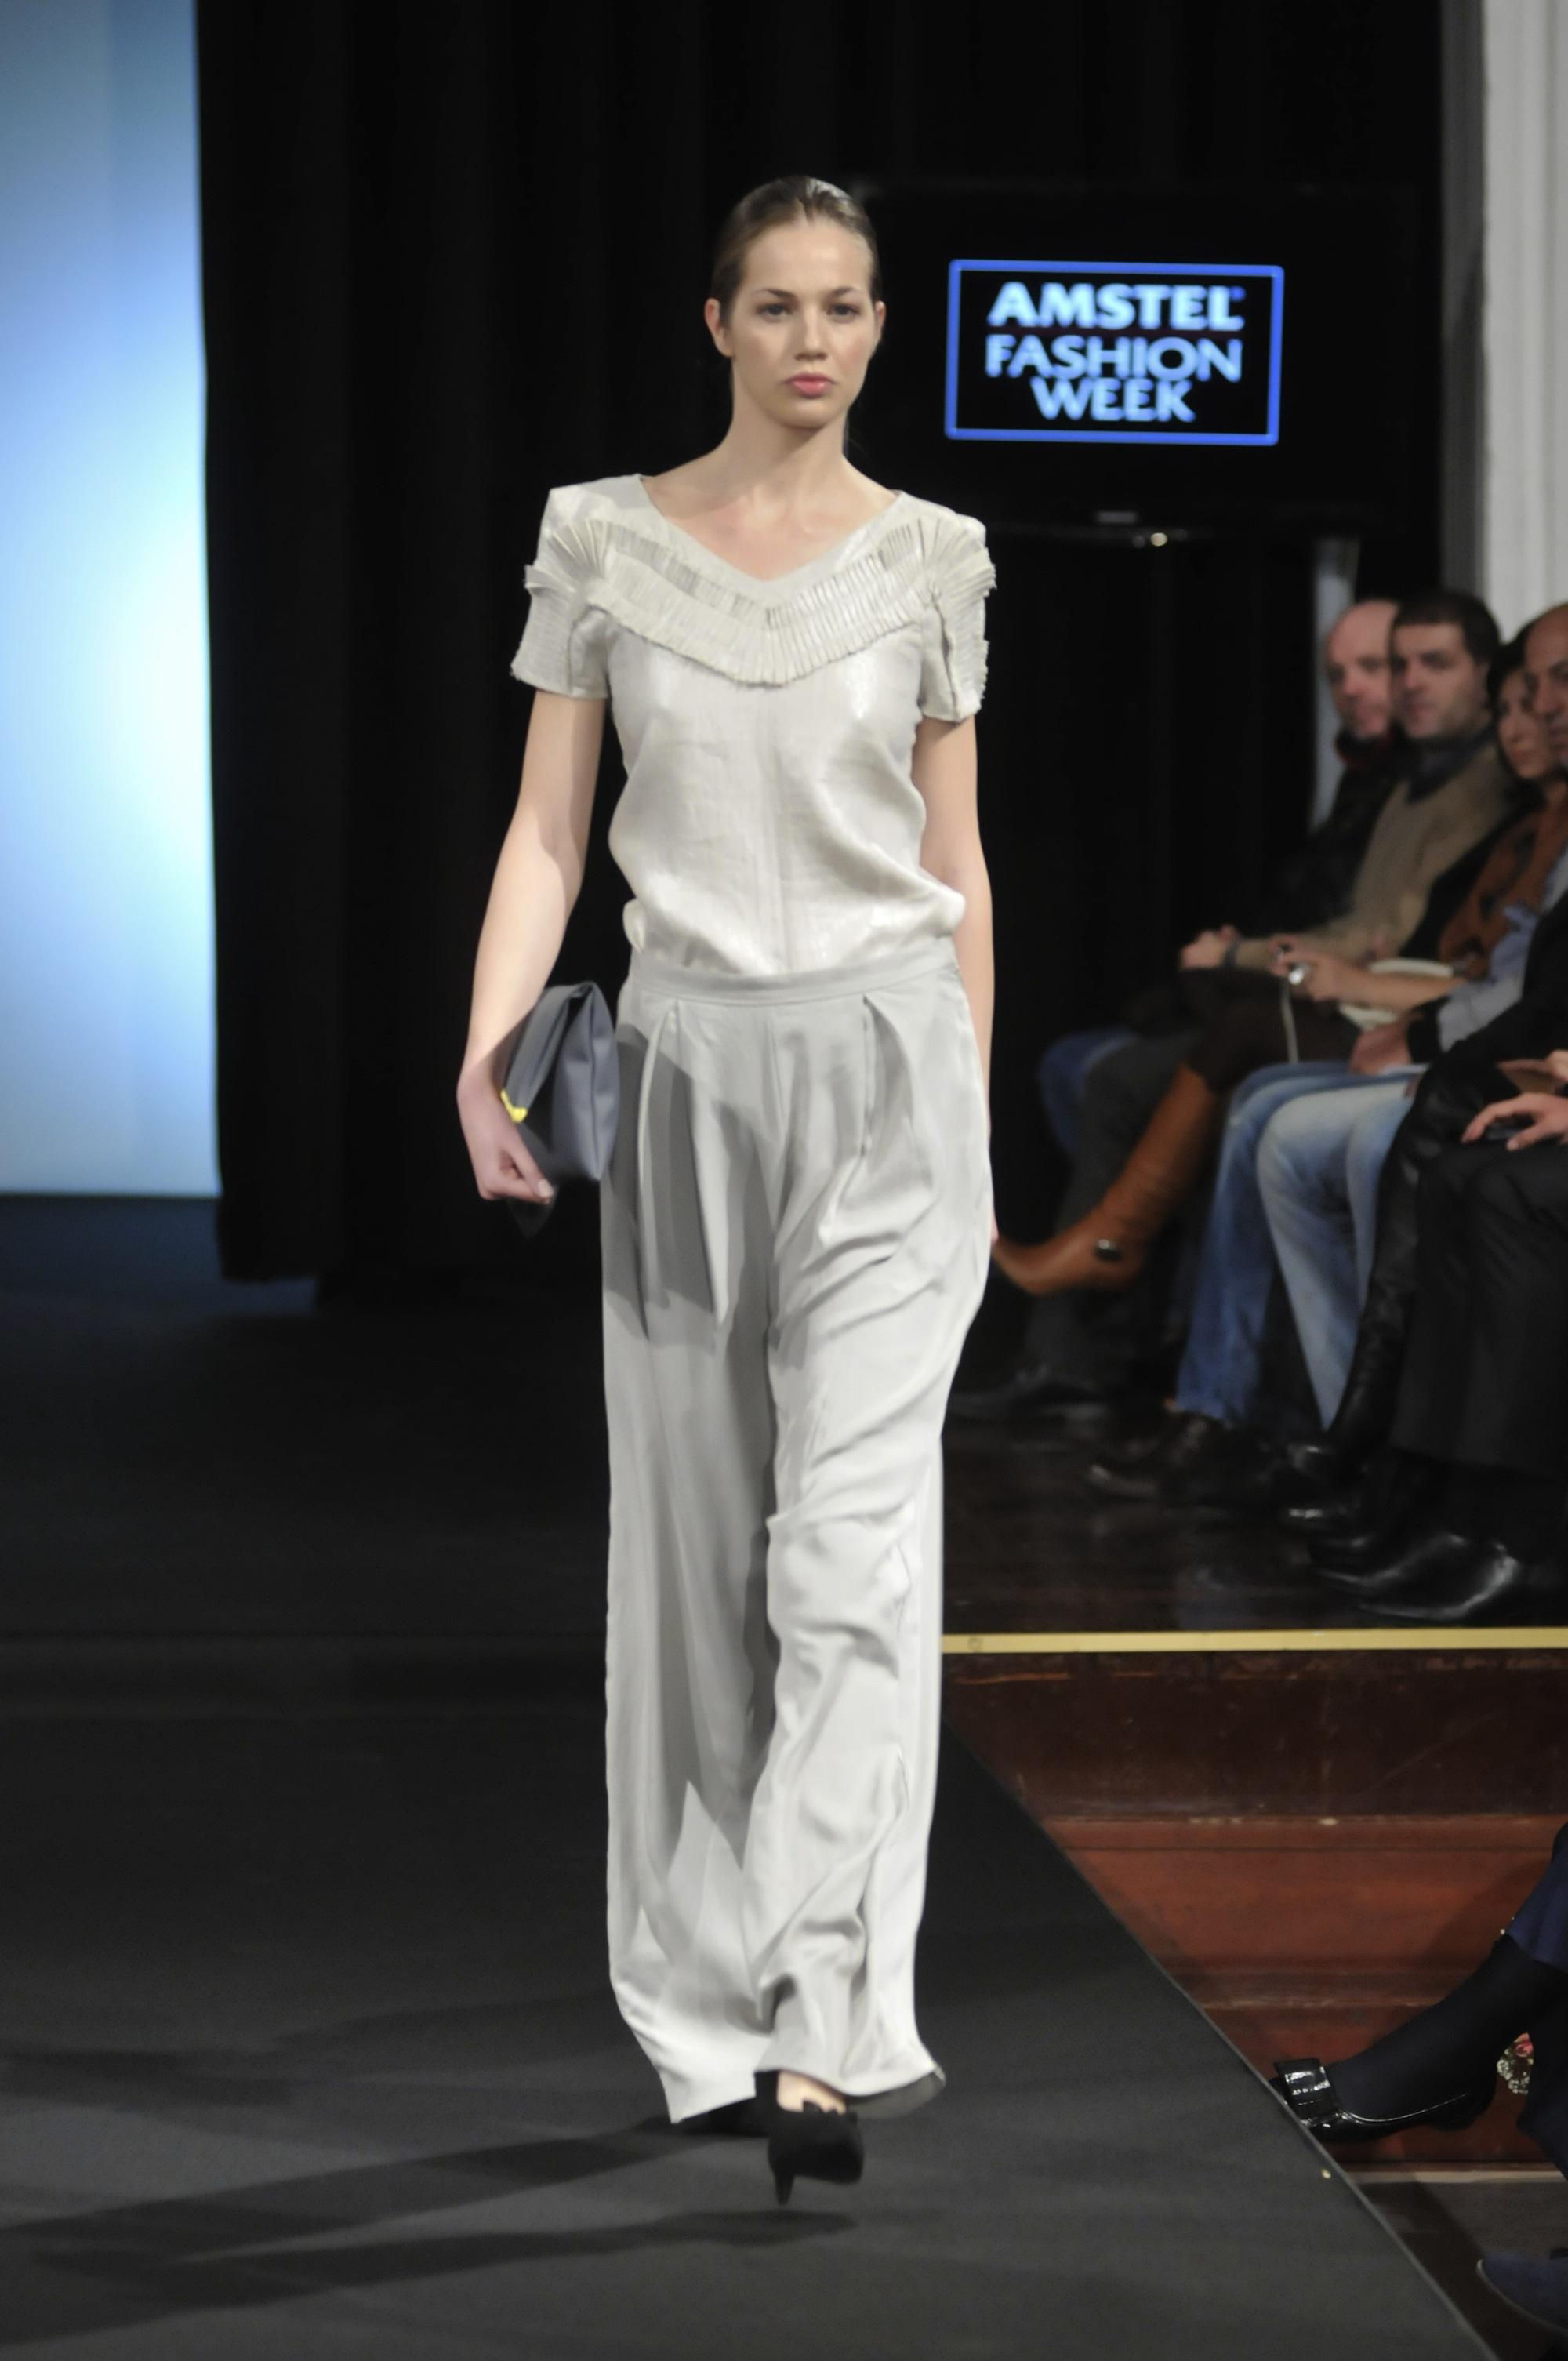 katarina bogranovic fpu 30. Amstel Fashion Week: 2. veče